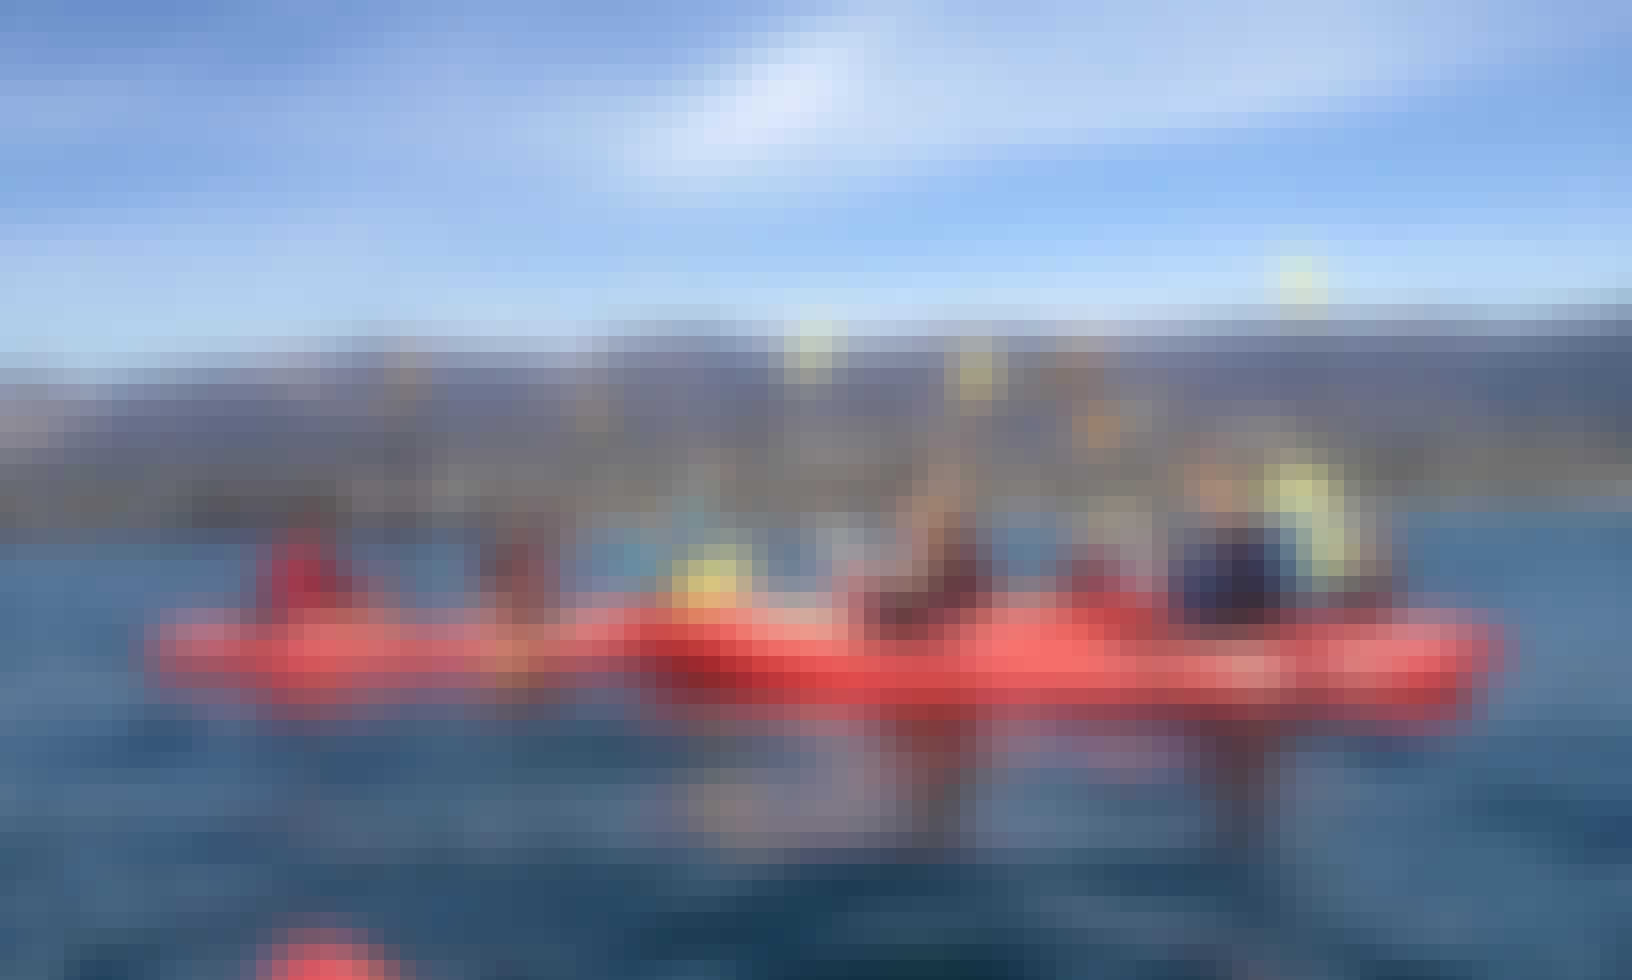 Hourly Kayak Rental on Santa Barbara Harbor, California